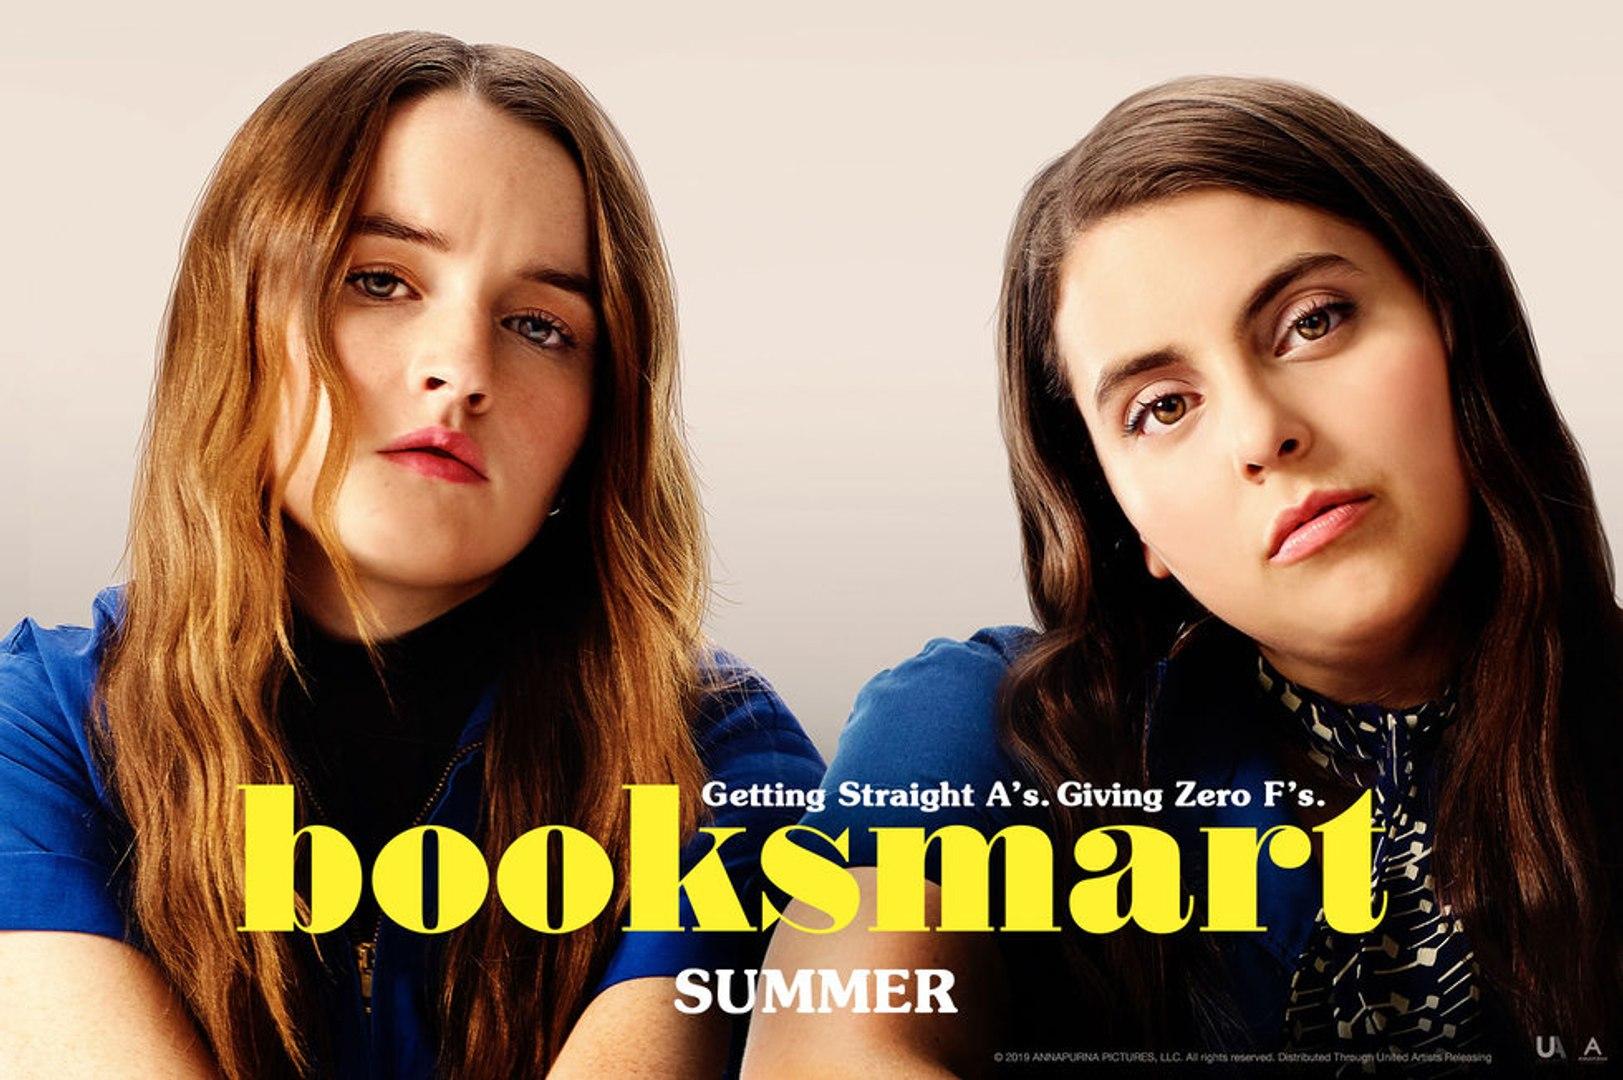 Booksmart cover image